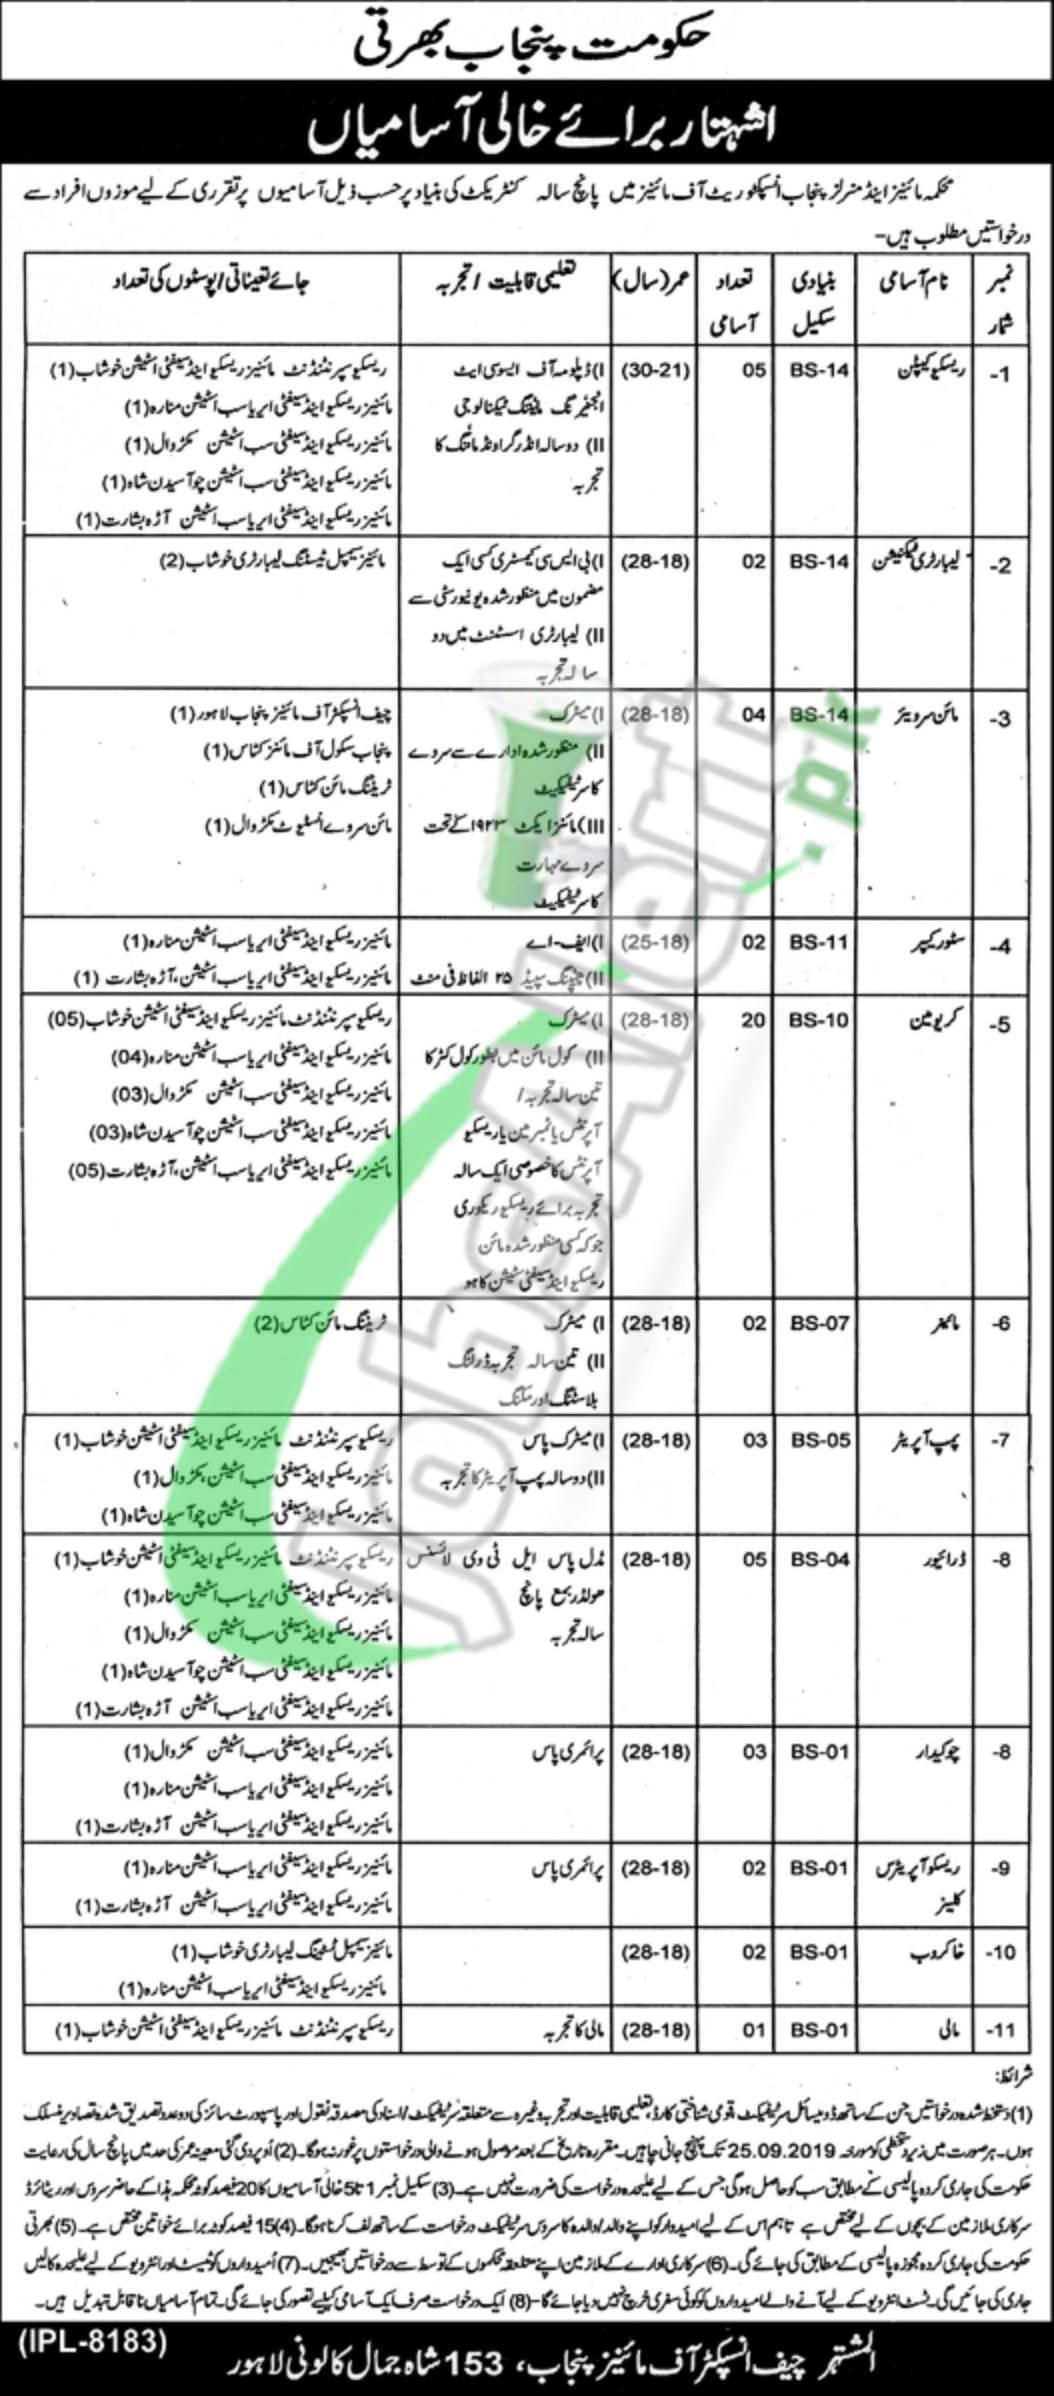 Mines & Minerals Department Punjab Jobs